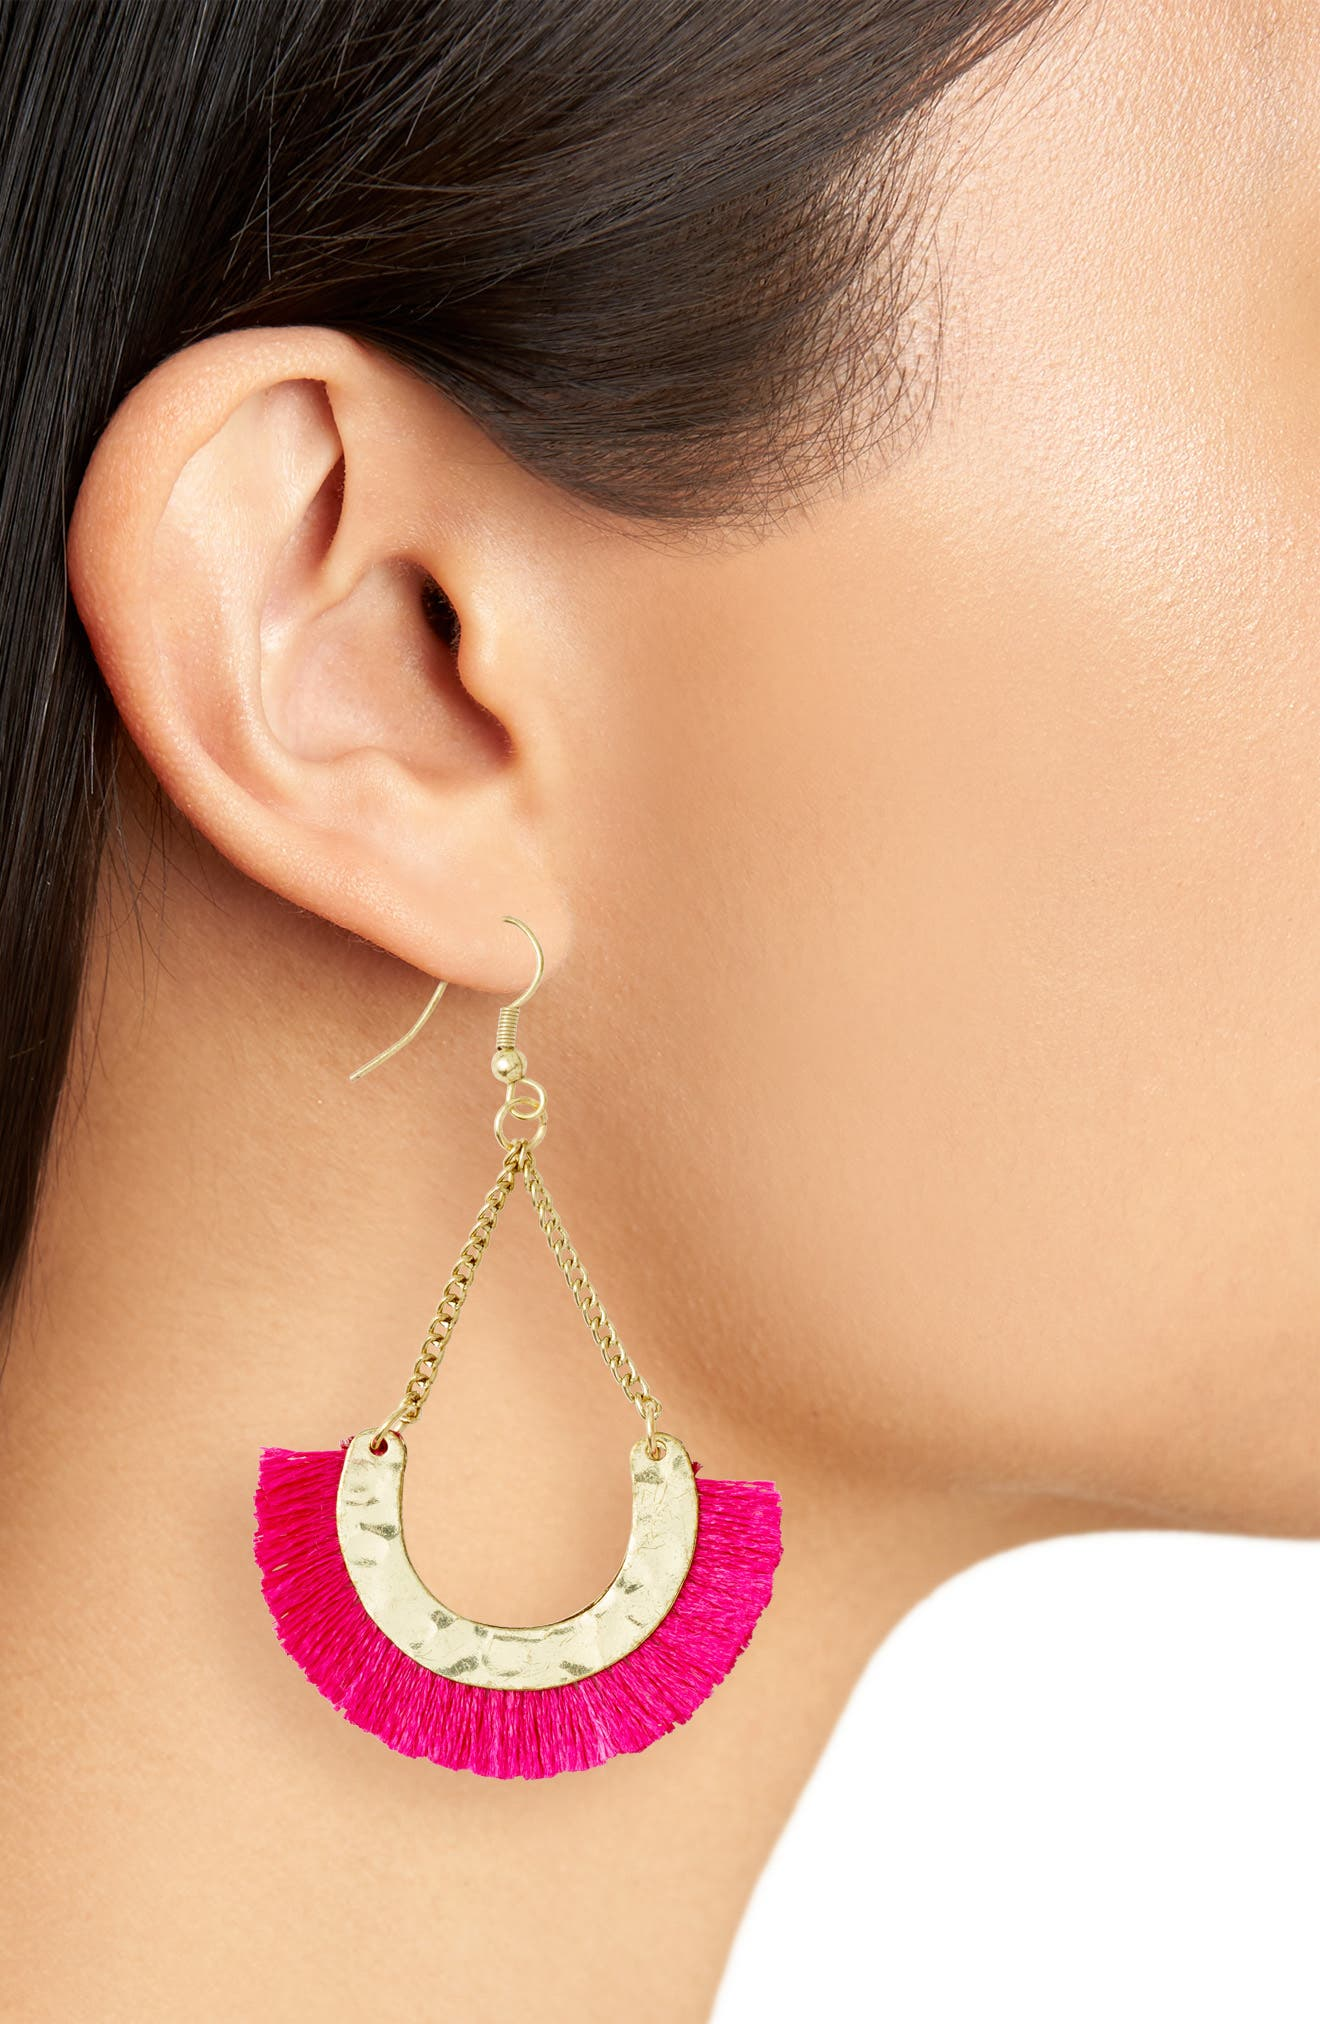 Maldives Fringed Fan Earrings,                             Alternate thumbnail 2, color,                             Fuschia